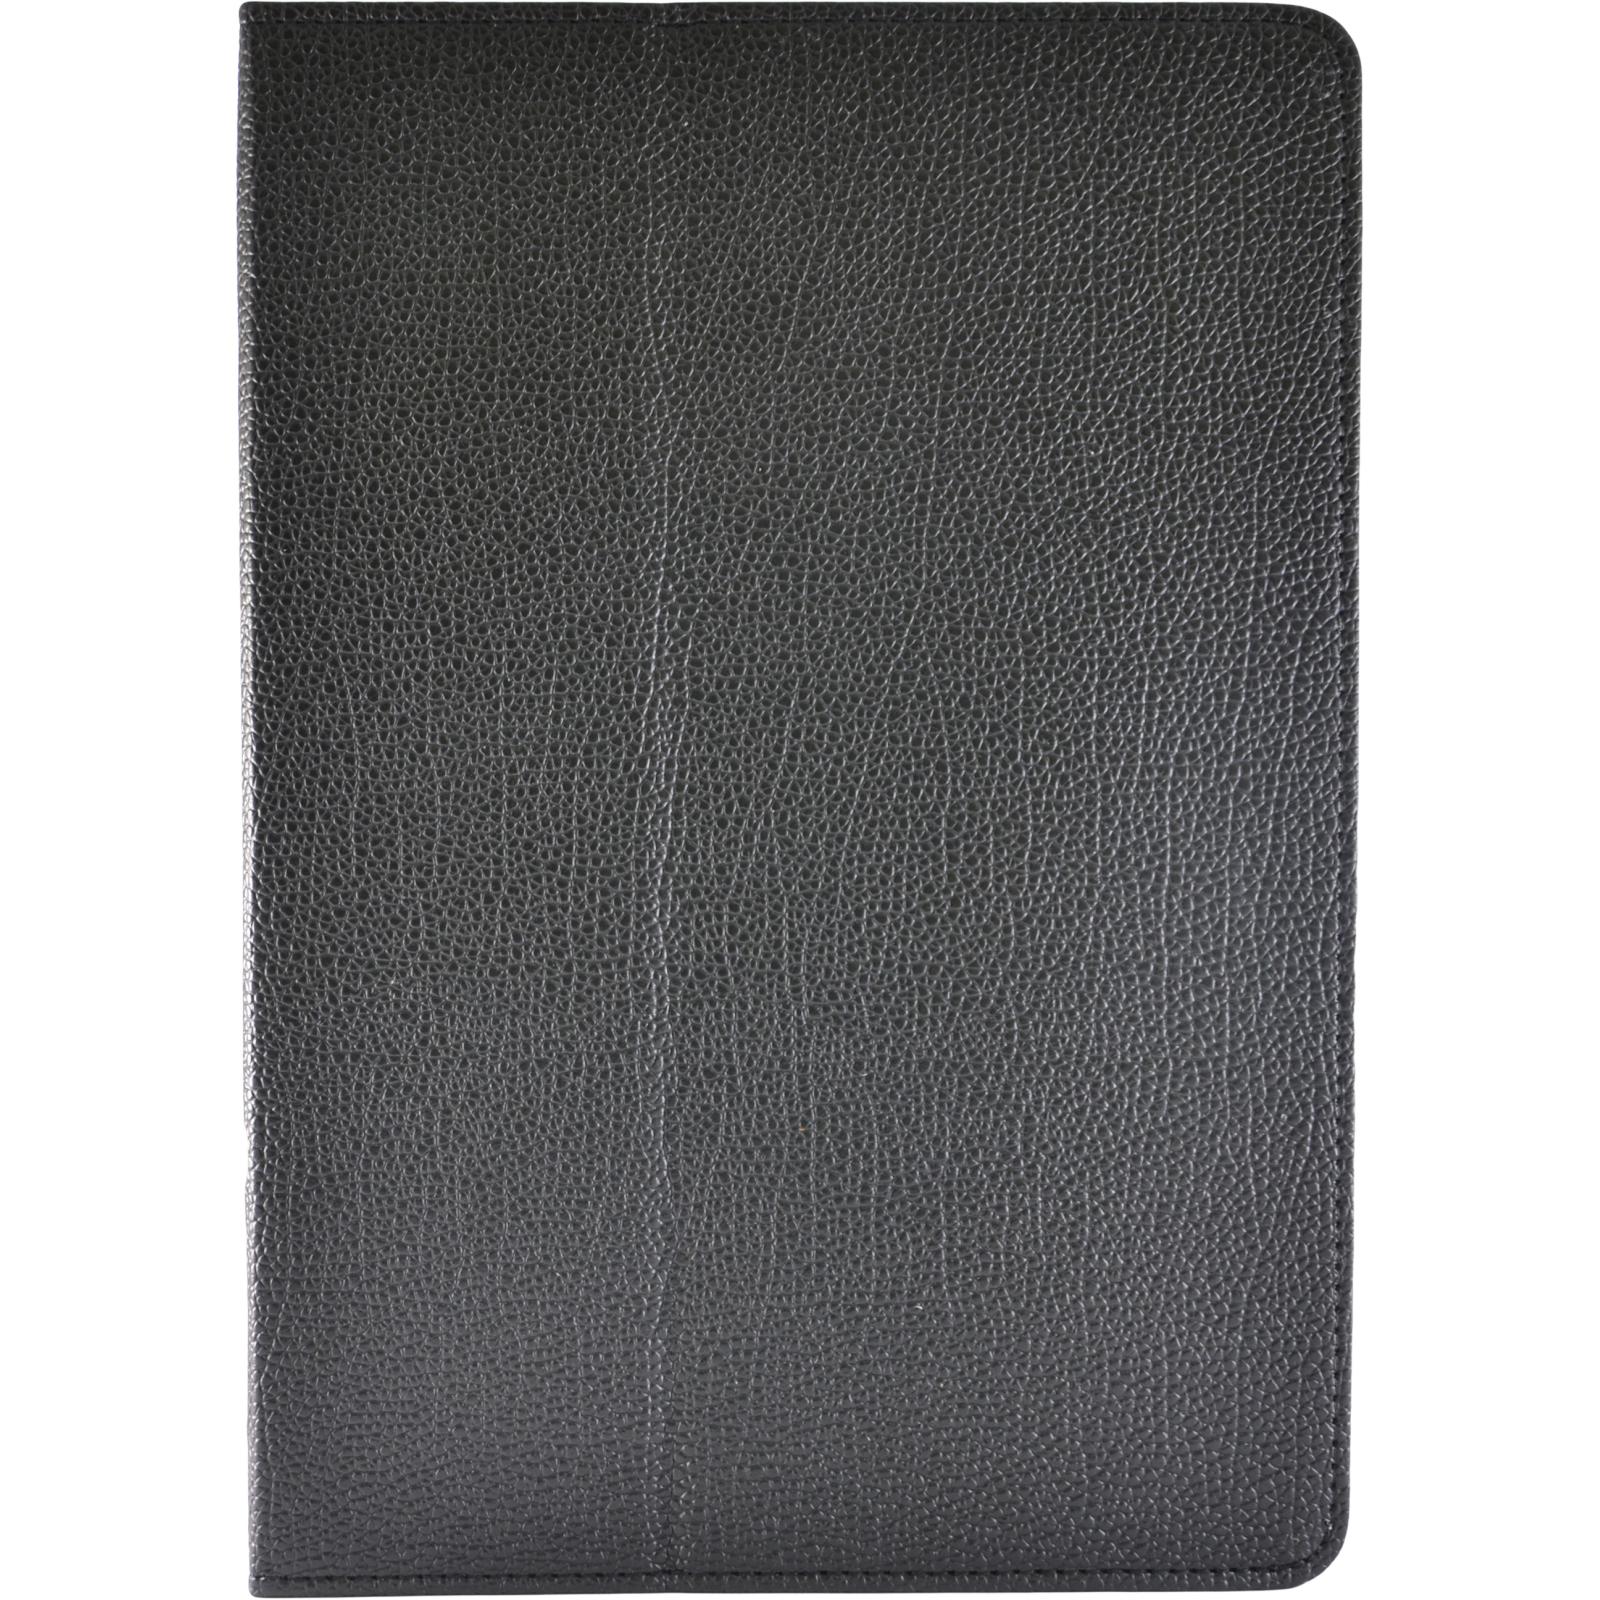 Чехол для планшета Pro-case Huawei MediaPad 10 Link S10-201u (HuawMP S10-201)